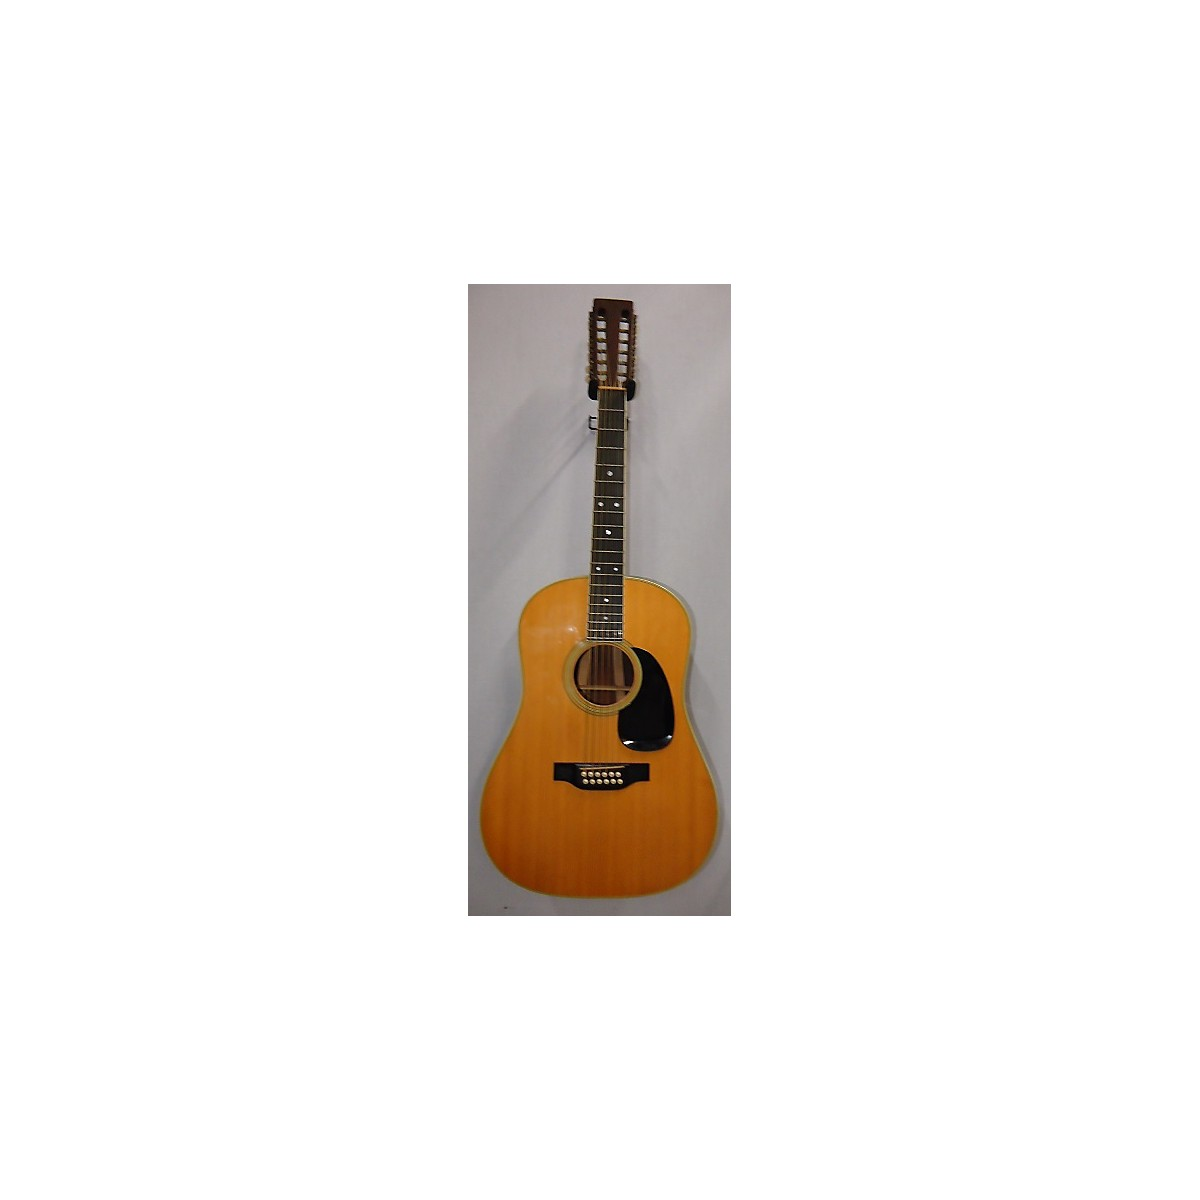 Martin 1975 D12-35 12 String Acoustic Guitar